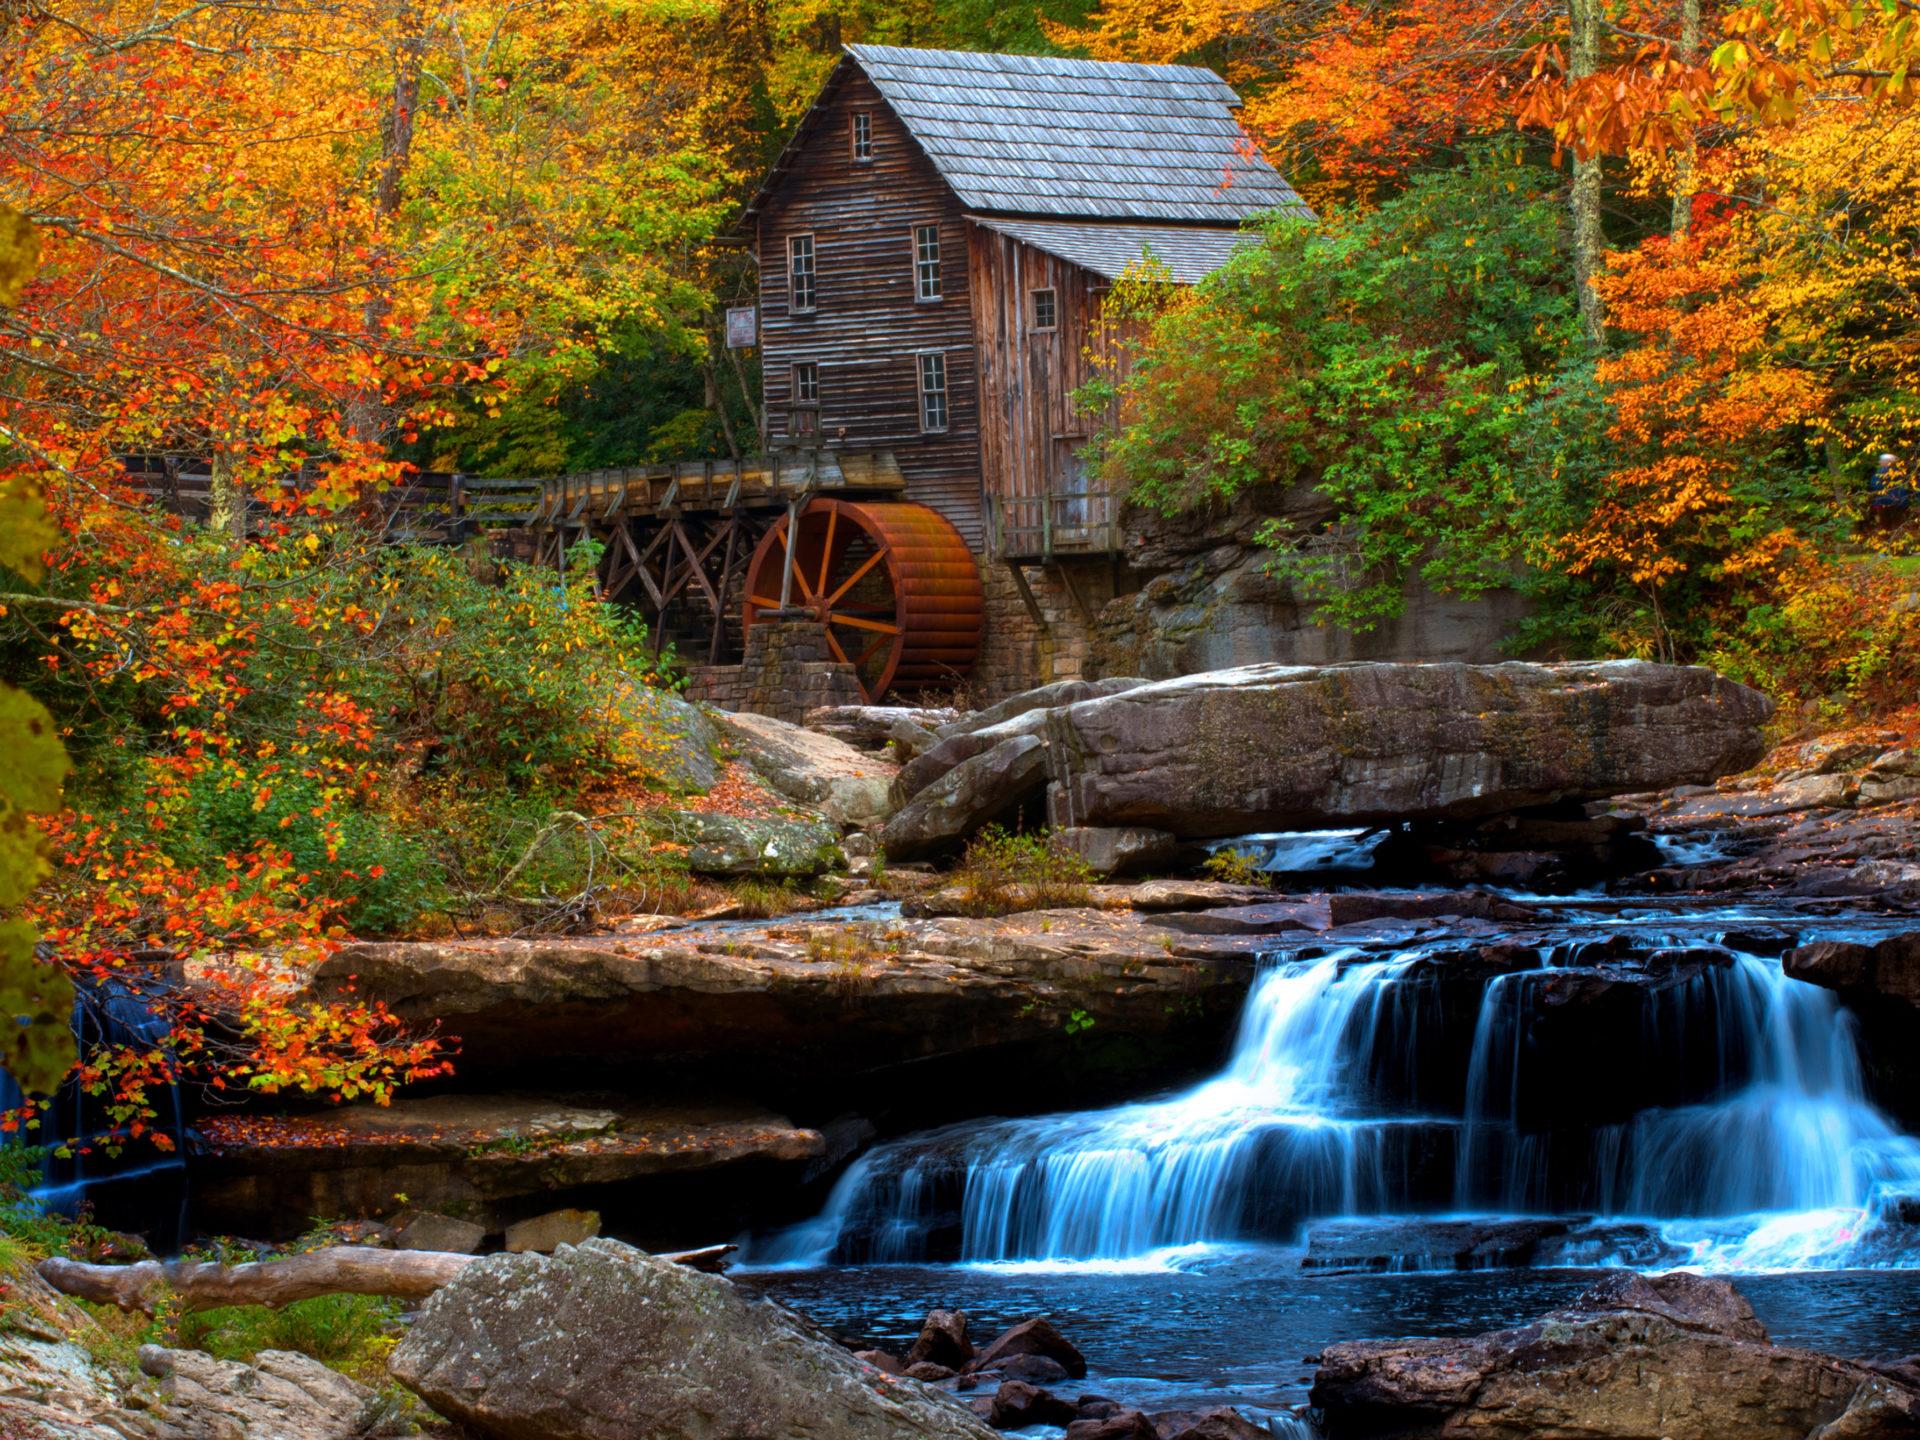 Old Wooden Mill Water Flow Rock Waterfall Hd Wallpaper For